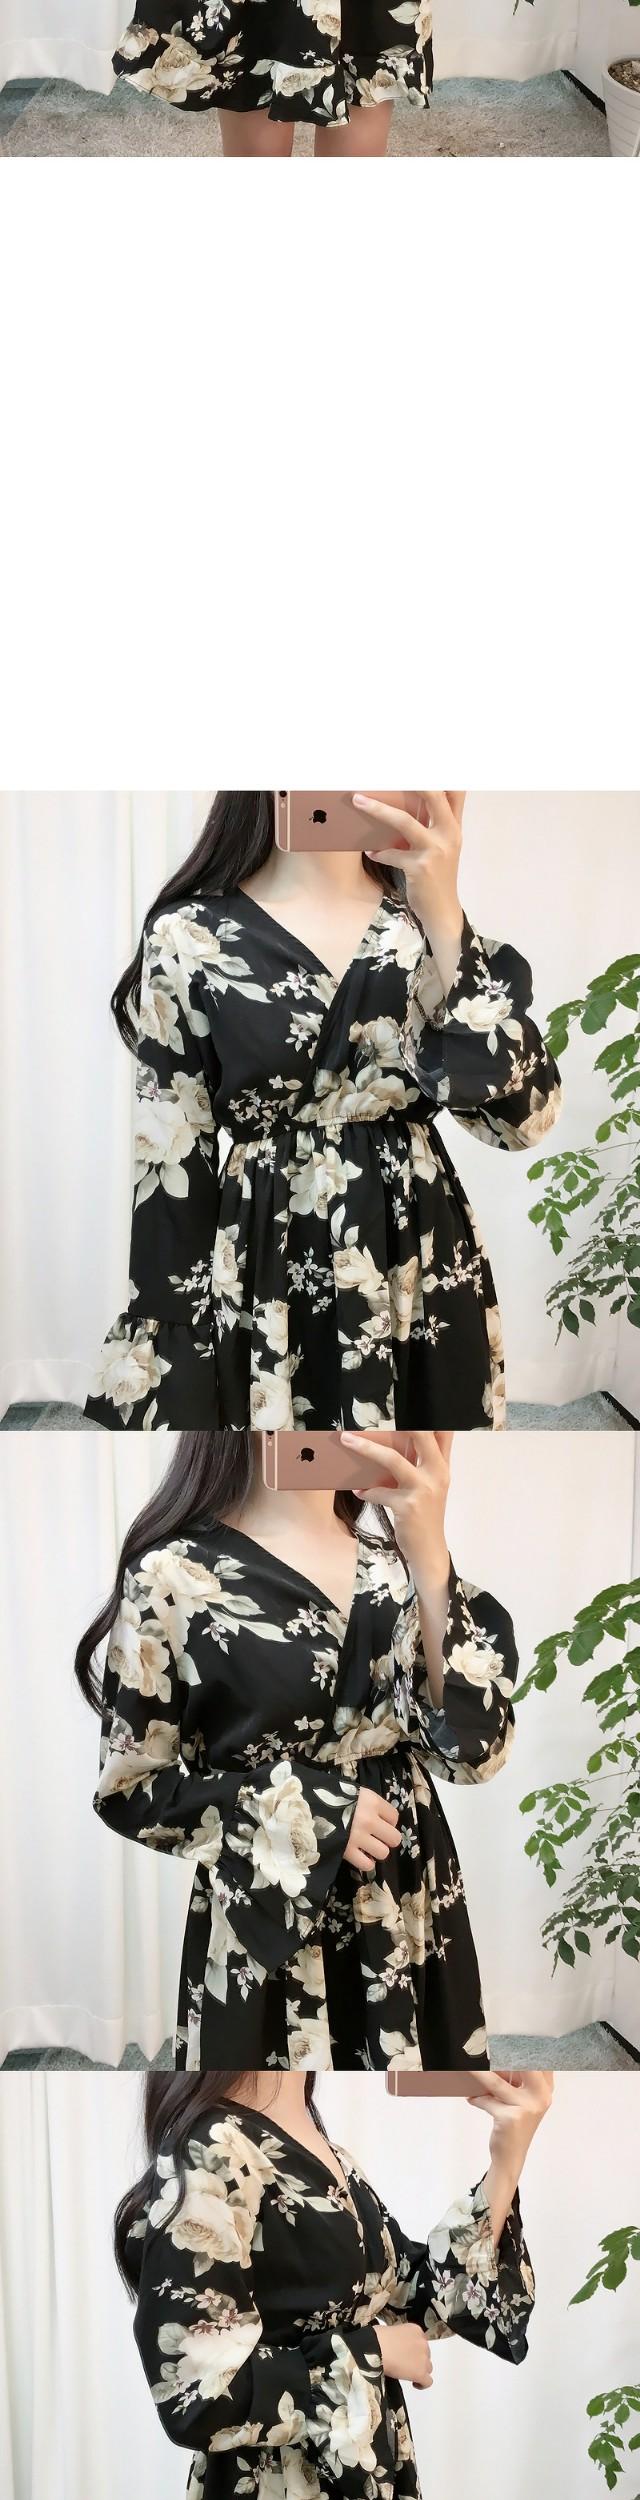 Planning Items Black Flower Dress